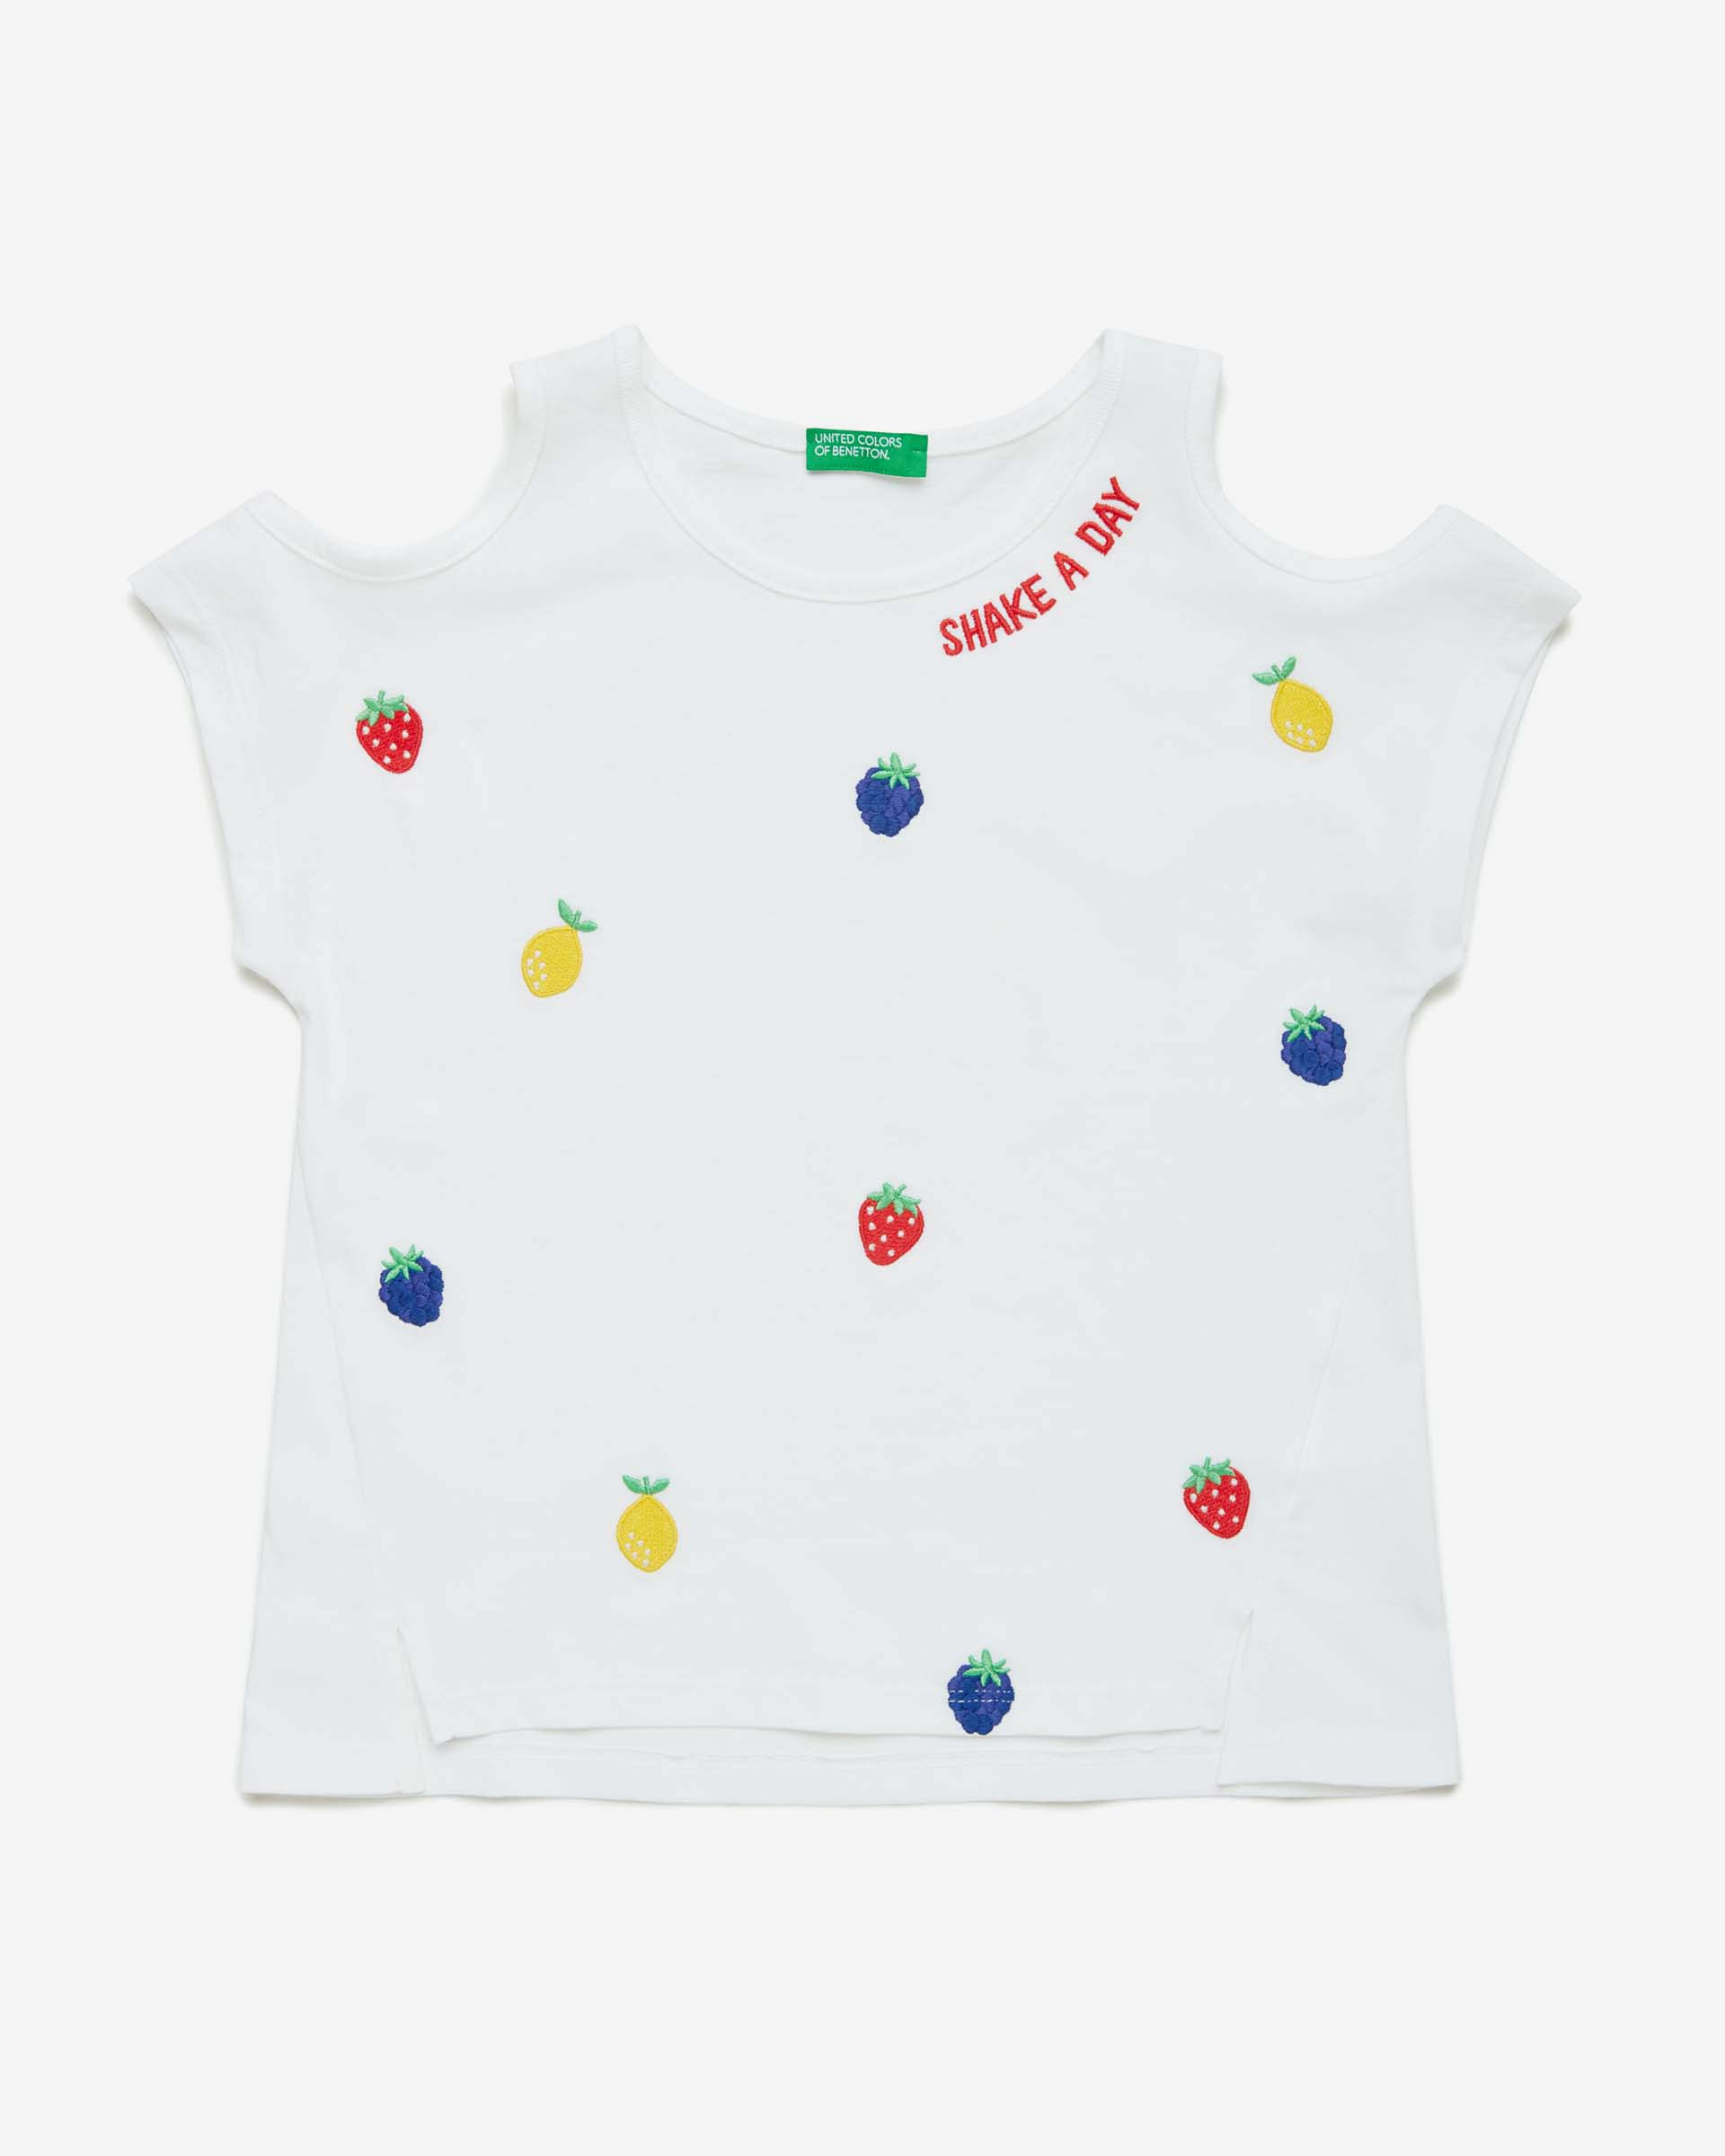 Купить 20P_3096C14LY_101, Футболка для девочек Benetton 3096C14LY_101 р-р 140, United Colors of Benetton, Футболки для девочек